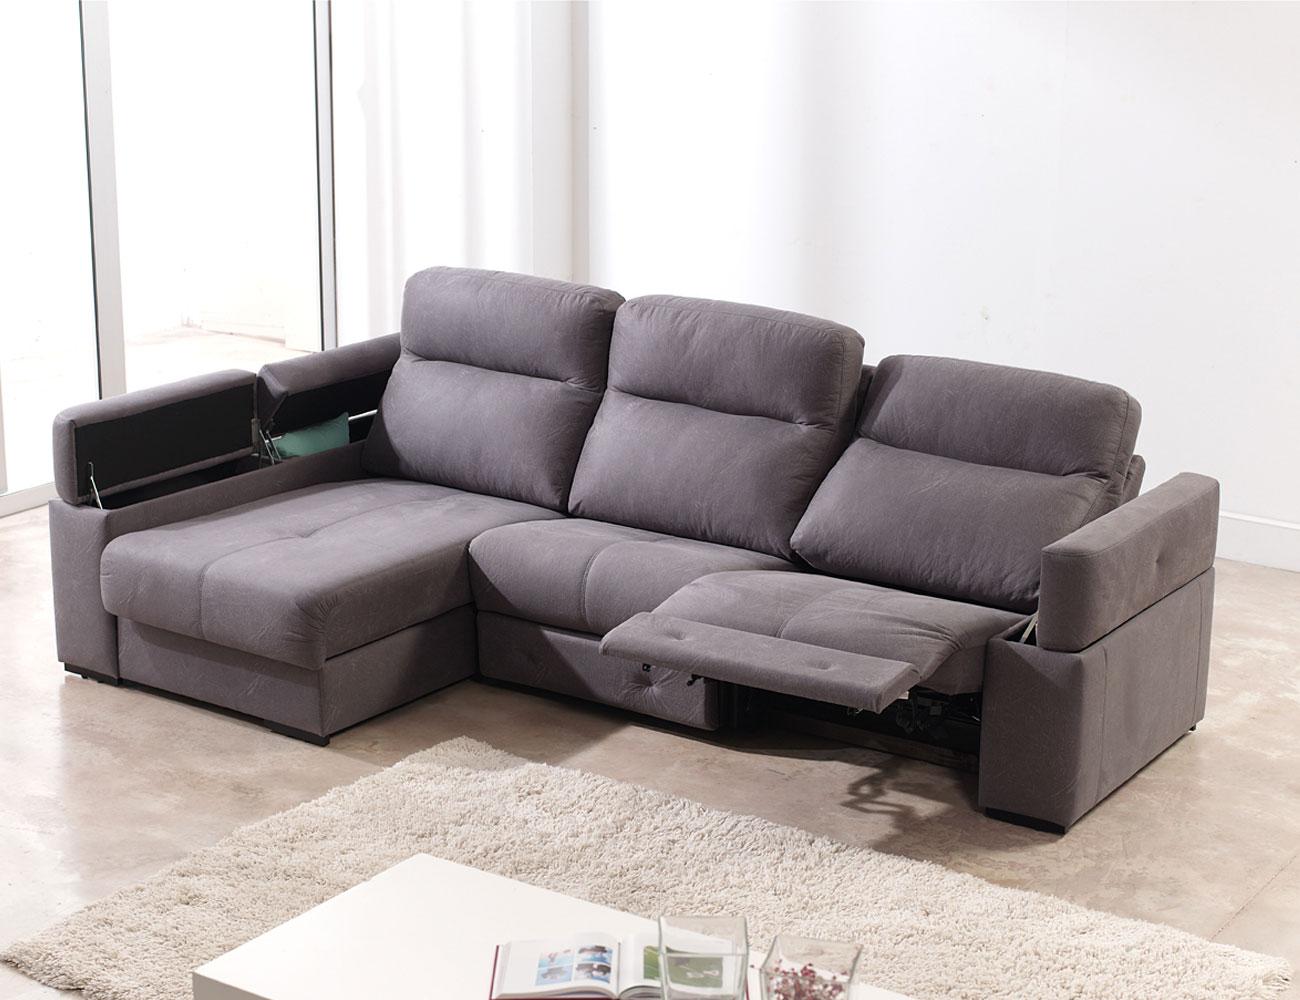 Sofa chaiselongue relax motor electrico 3 arcon 11